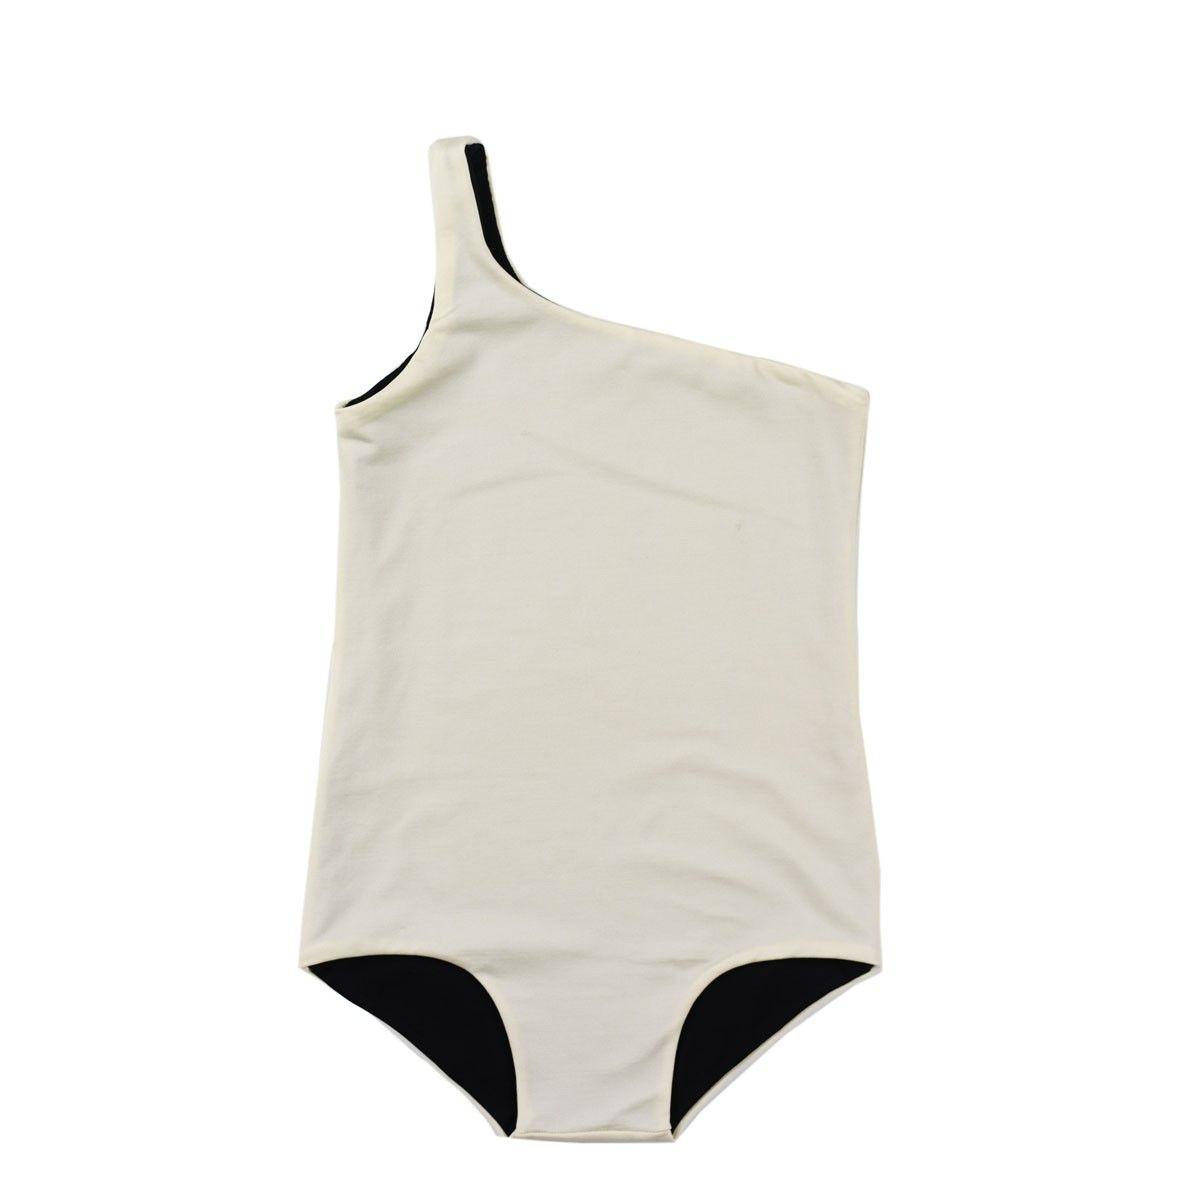 Swimsuit Little creative factory - littlefashionaddict